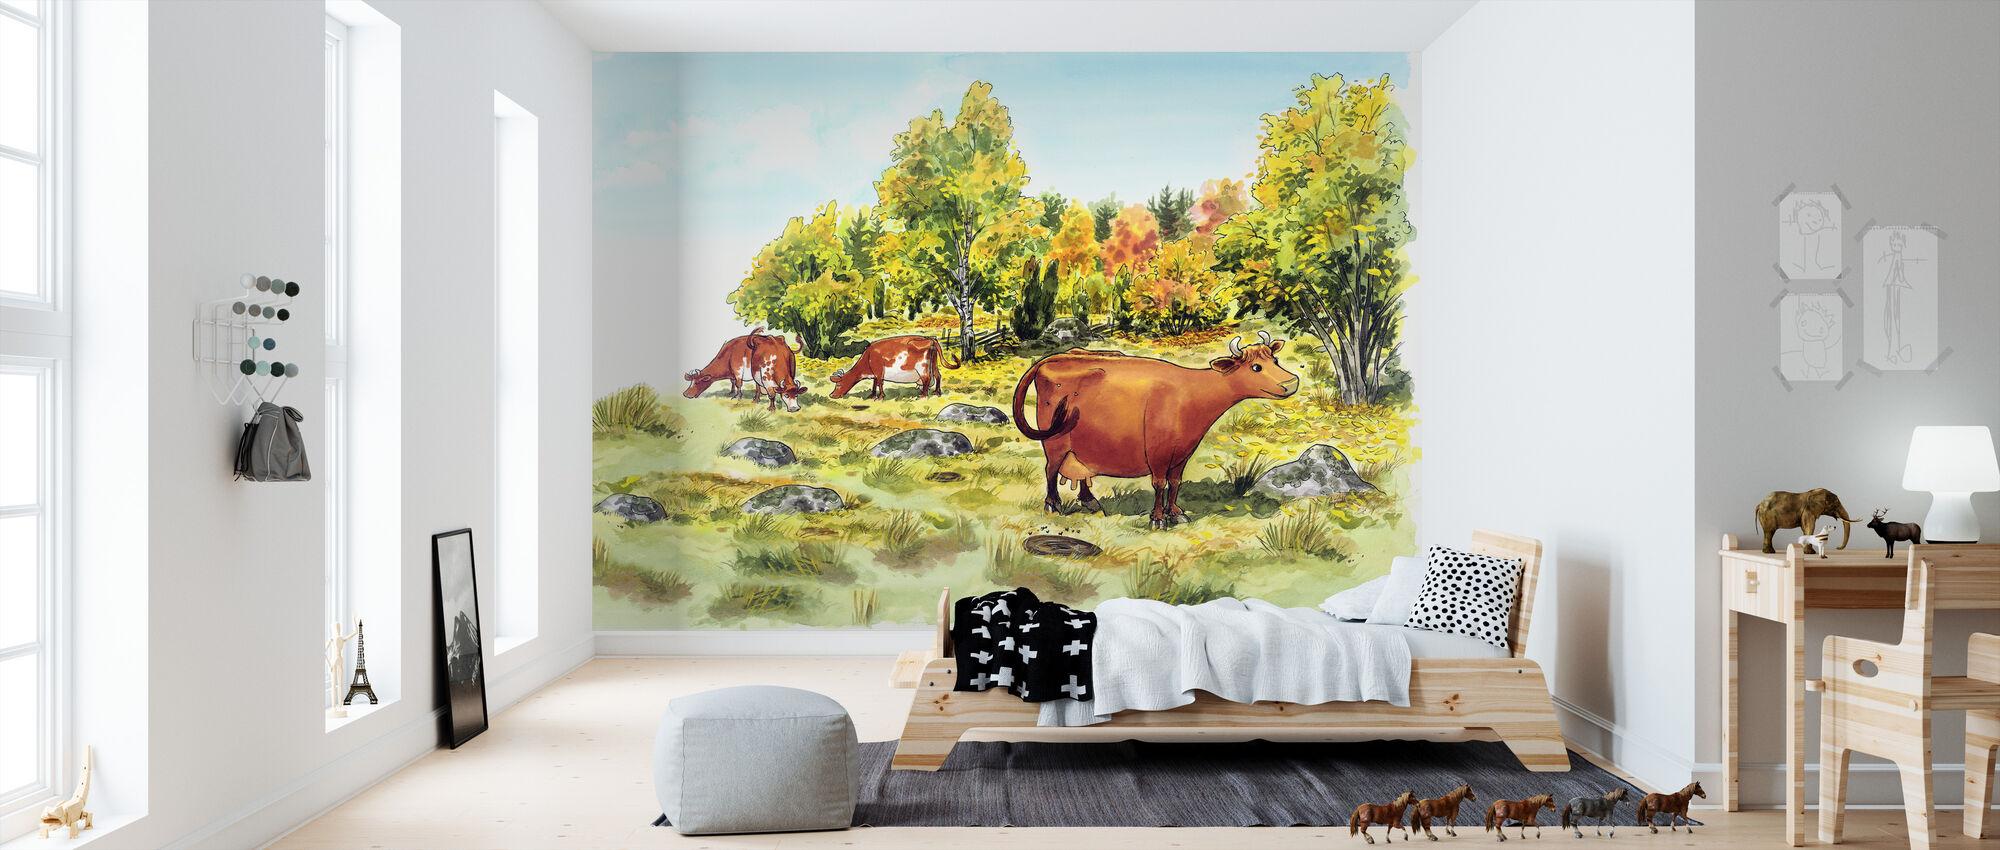 Mom Mu & Crow -Mom Mu - Wallpaper - Kids Room